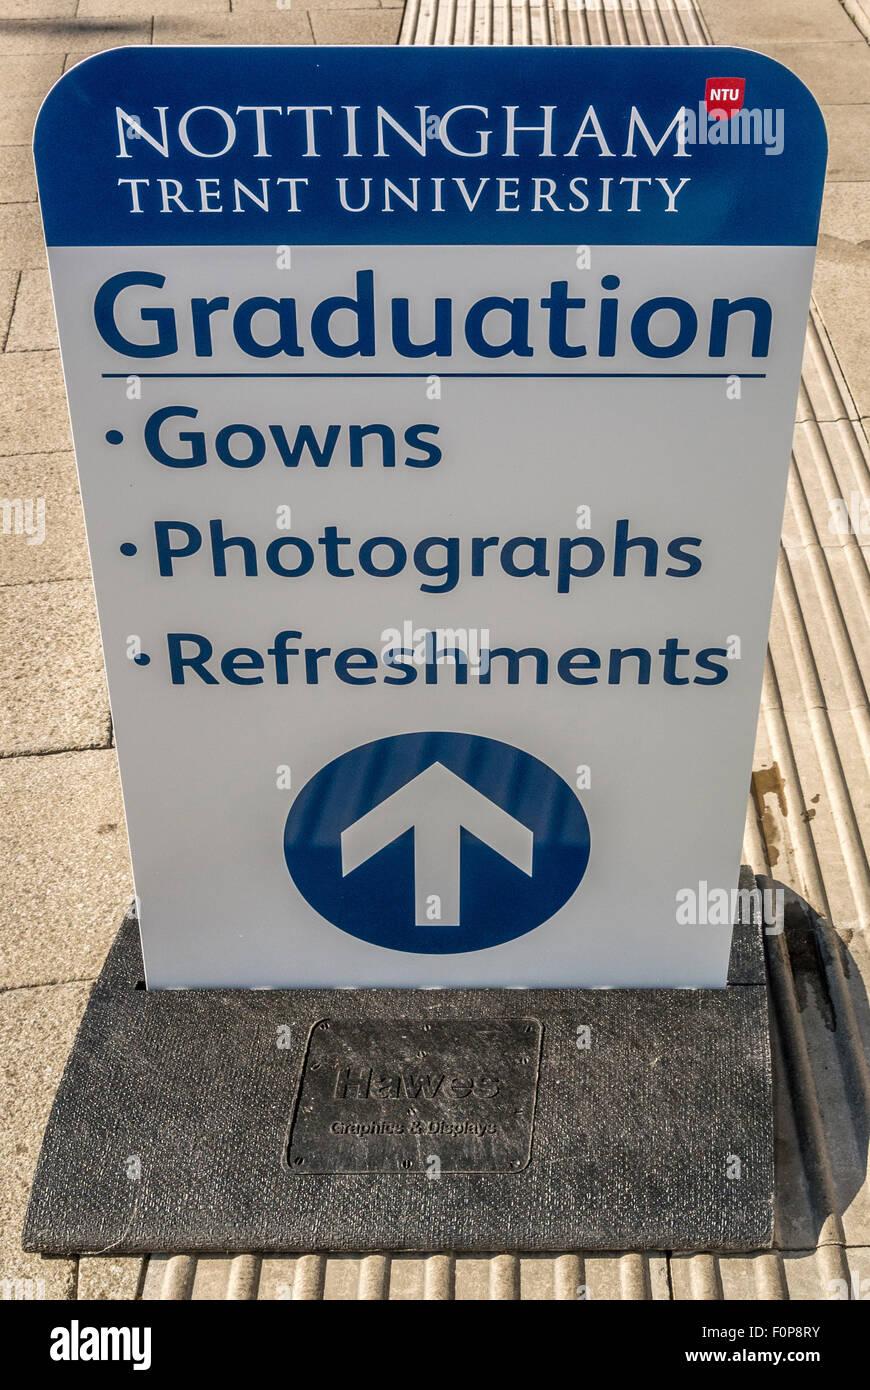 Graduation day sign at Nottingham Trent University - Stock Image